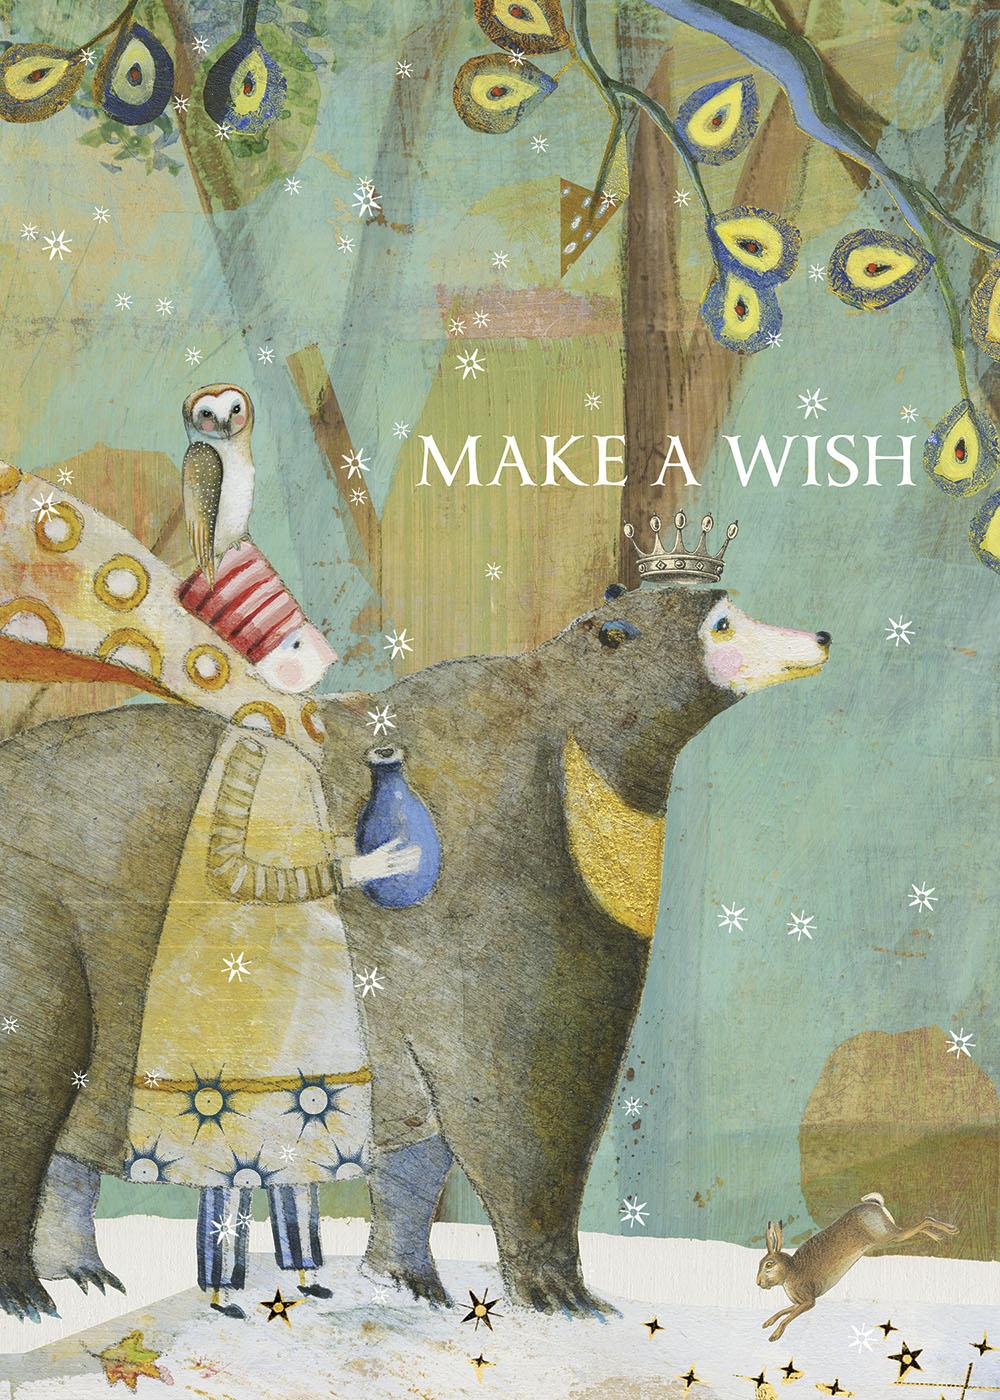 438-make a wish